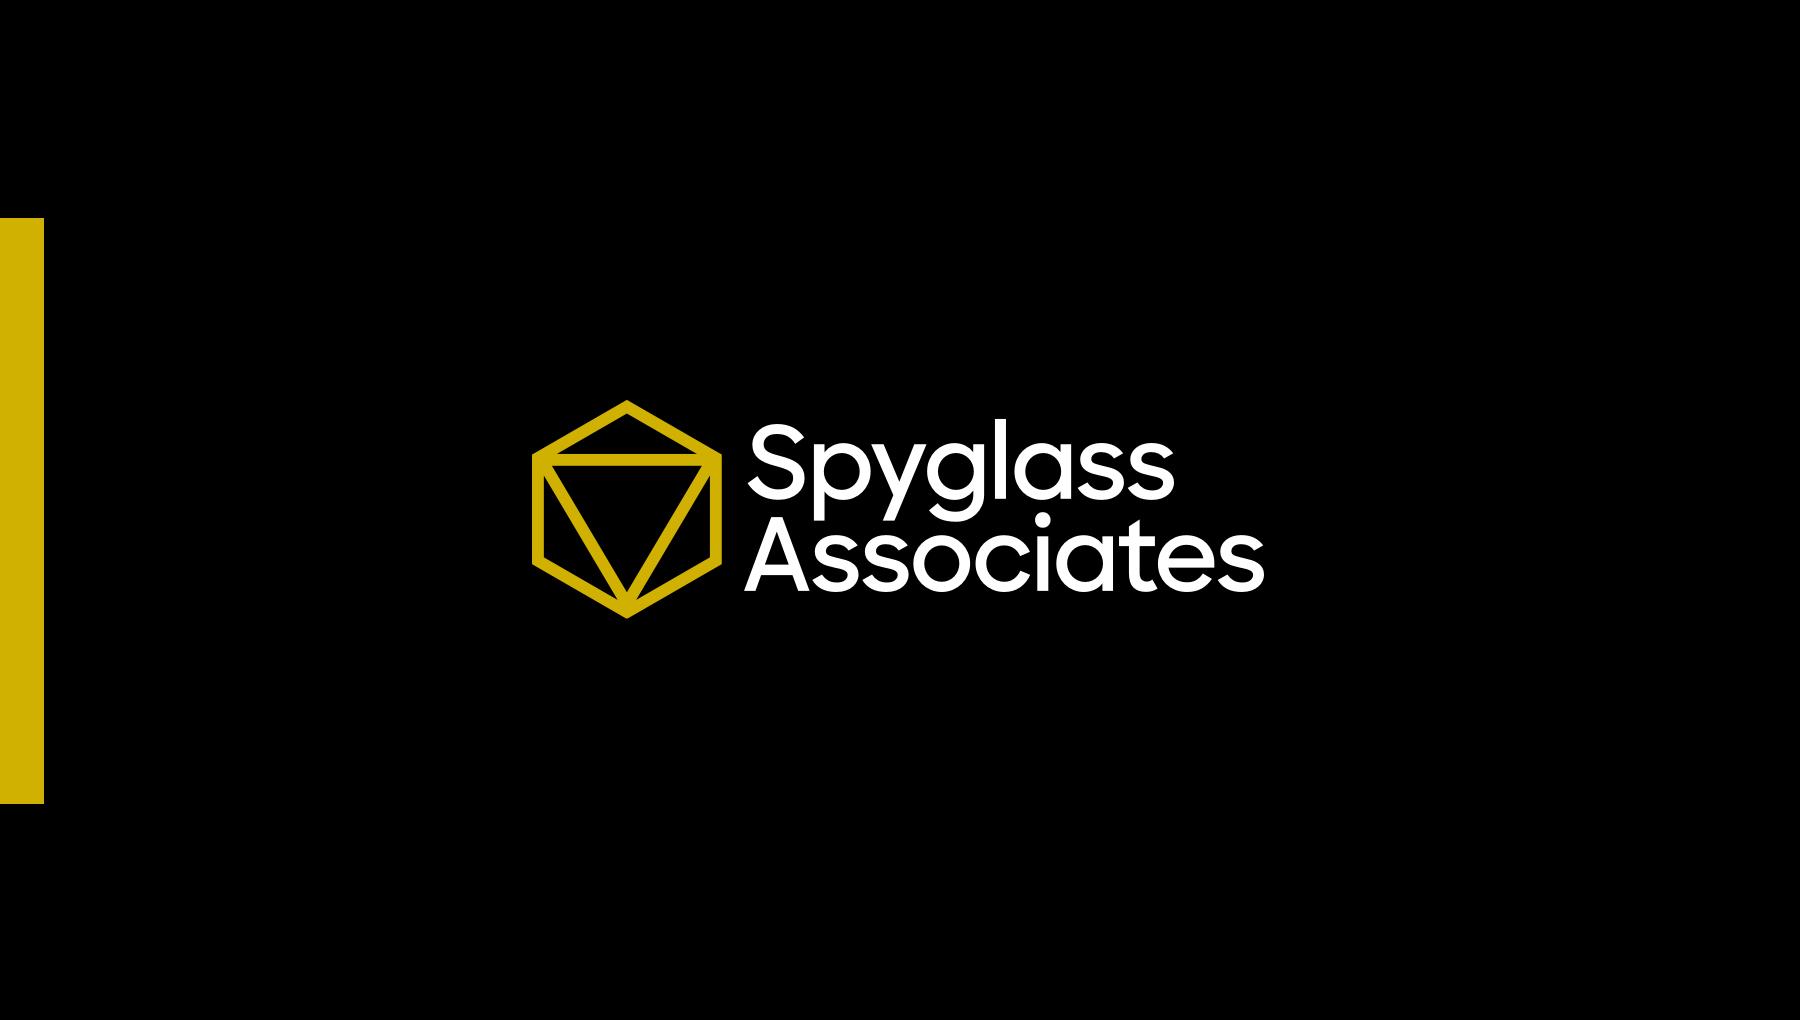 GOUGH_Spyglass.jpg